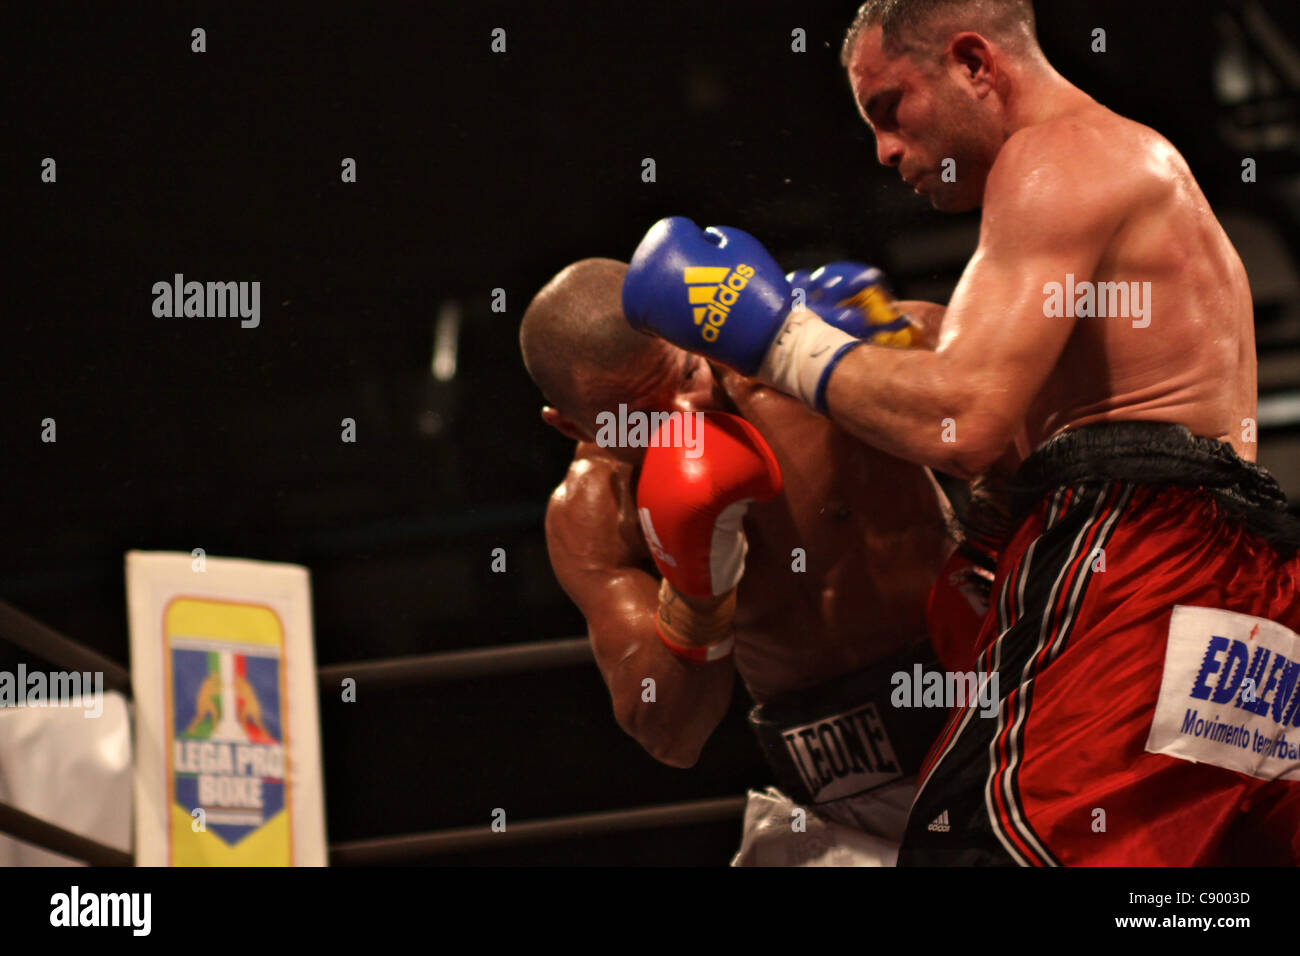 FLORENCE (IT), 04/Nov/2011: Bundu VS Petrucci, Welter Weight Boxing European Title @ Mandela Forum - Petrucci and - Stock Image